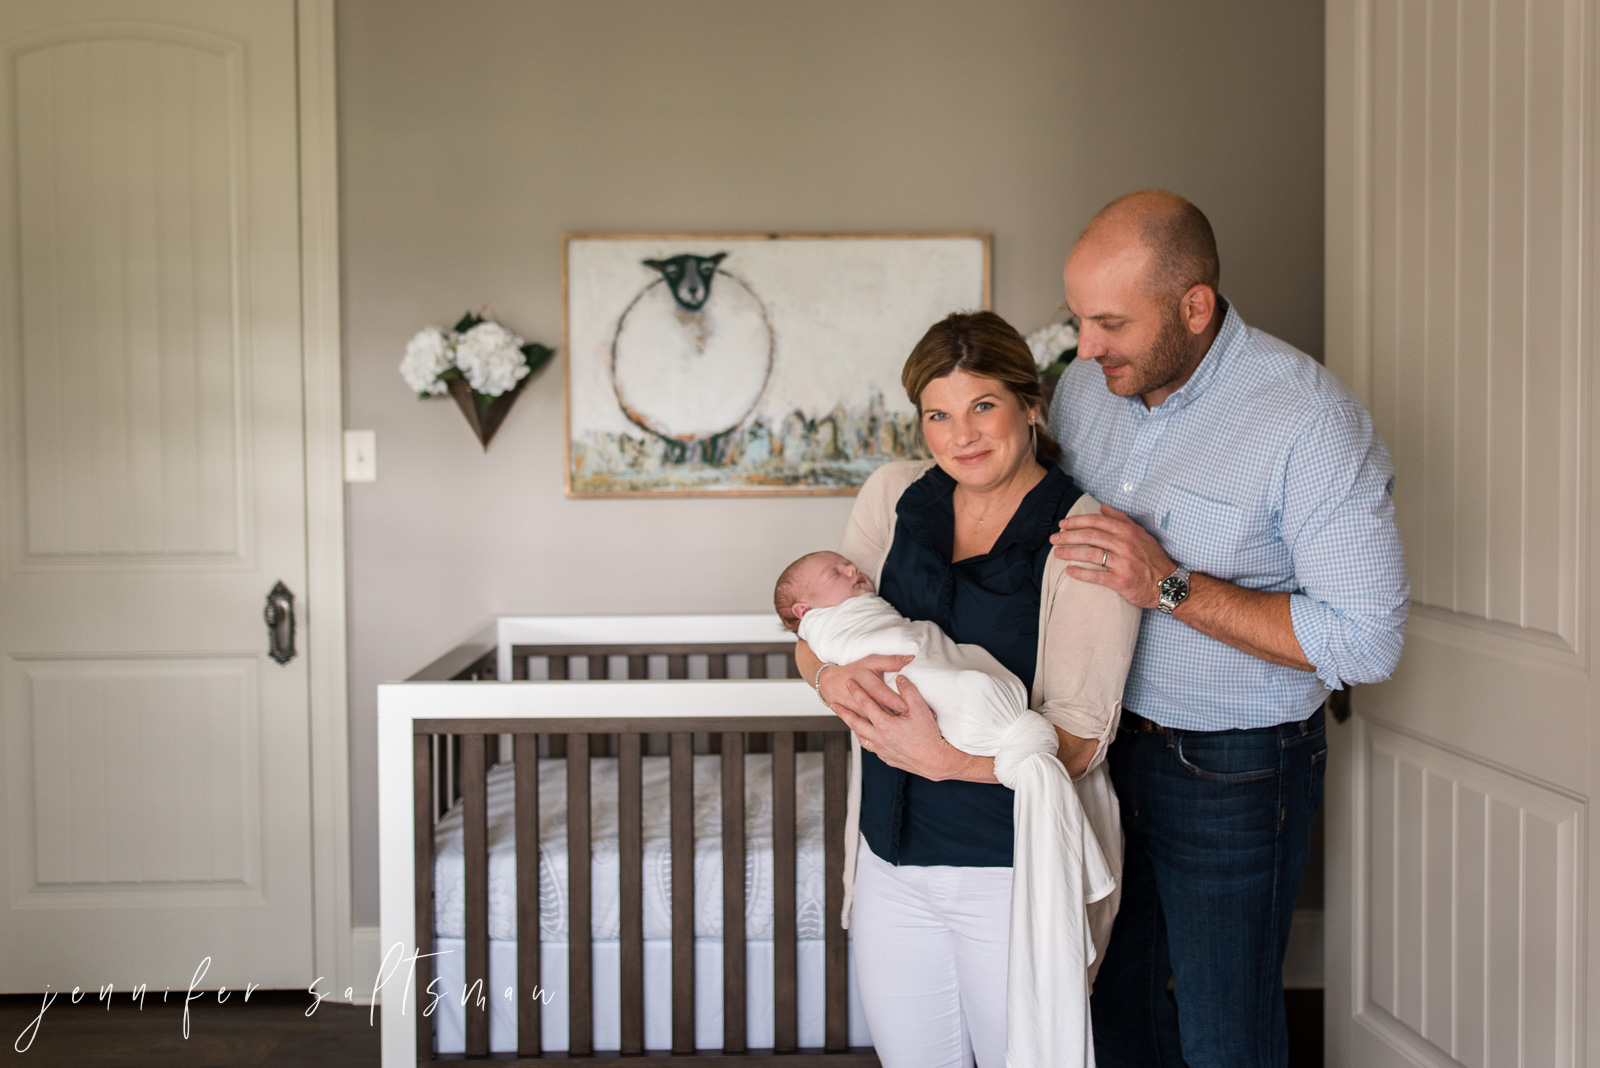 newborn baby boy photography session